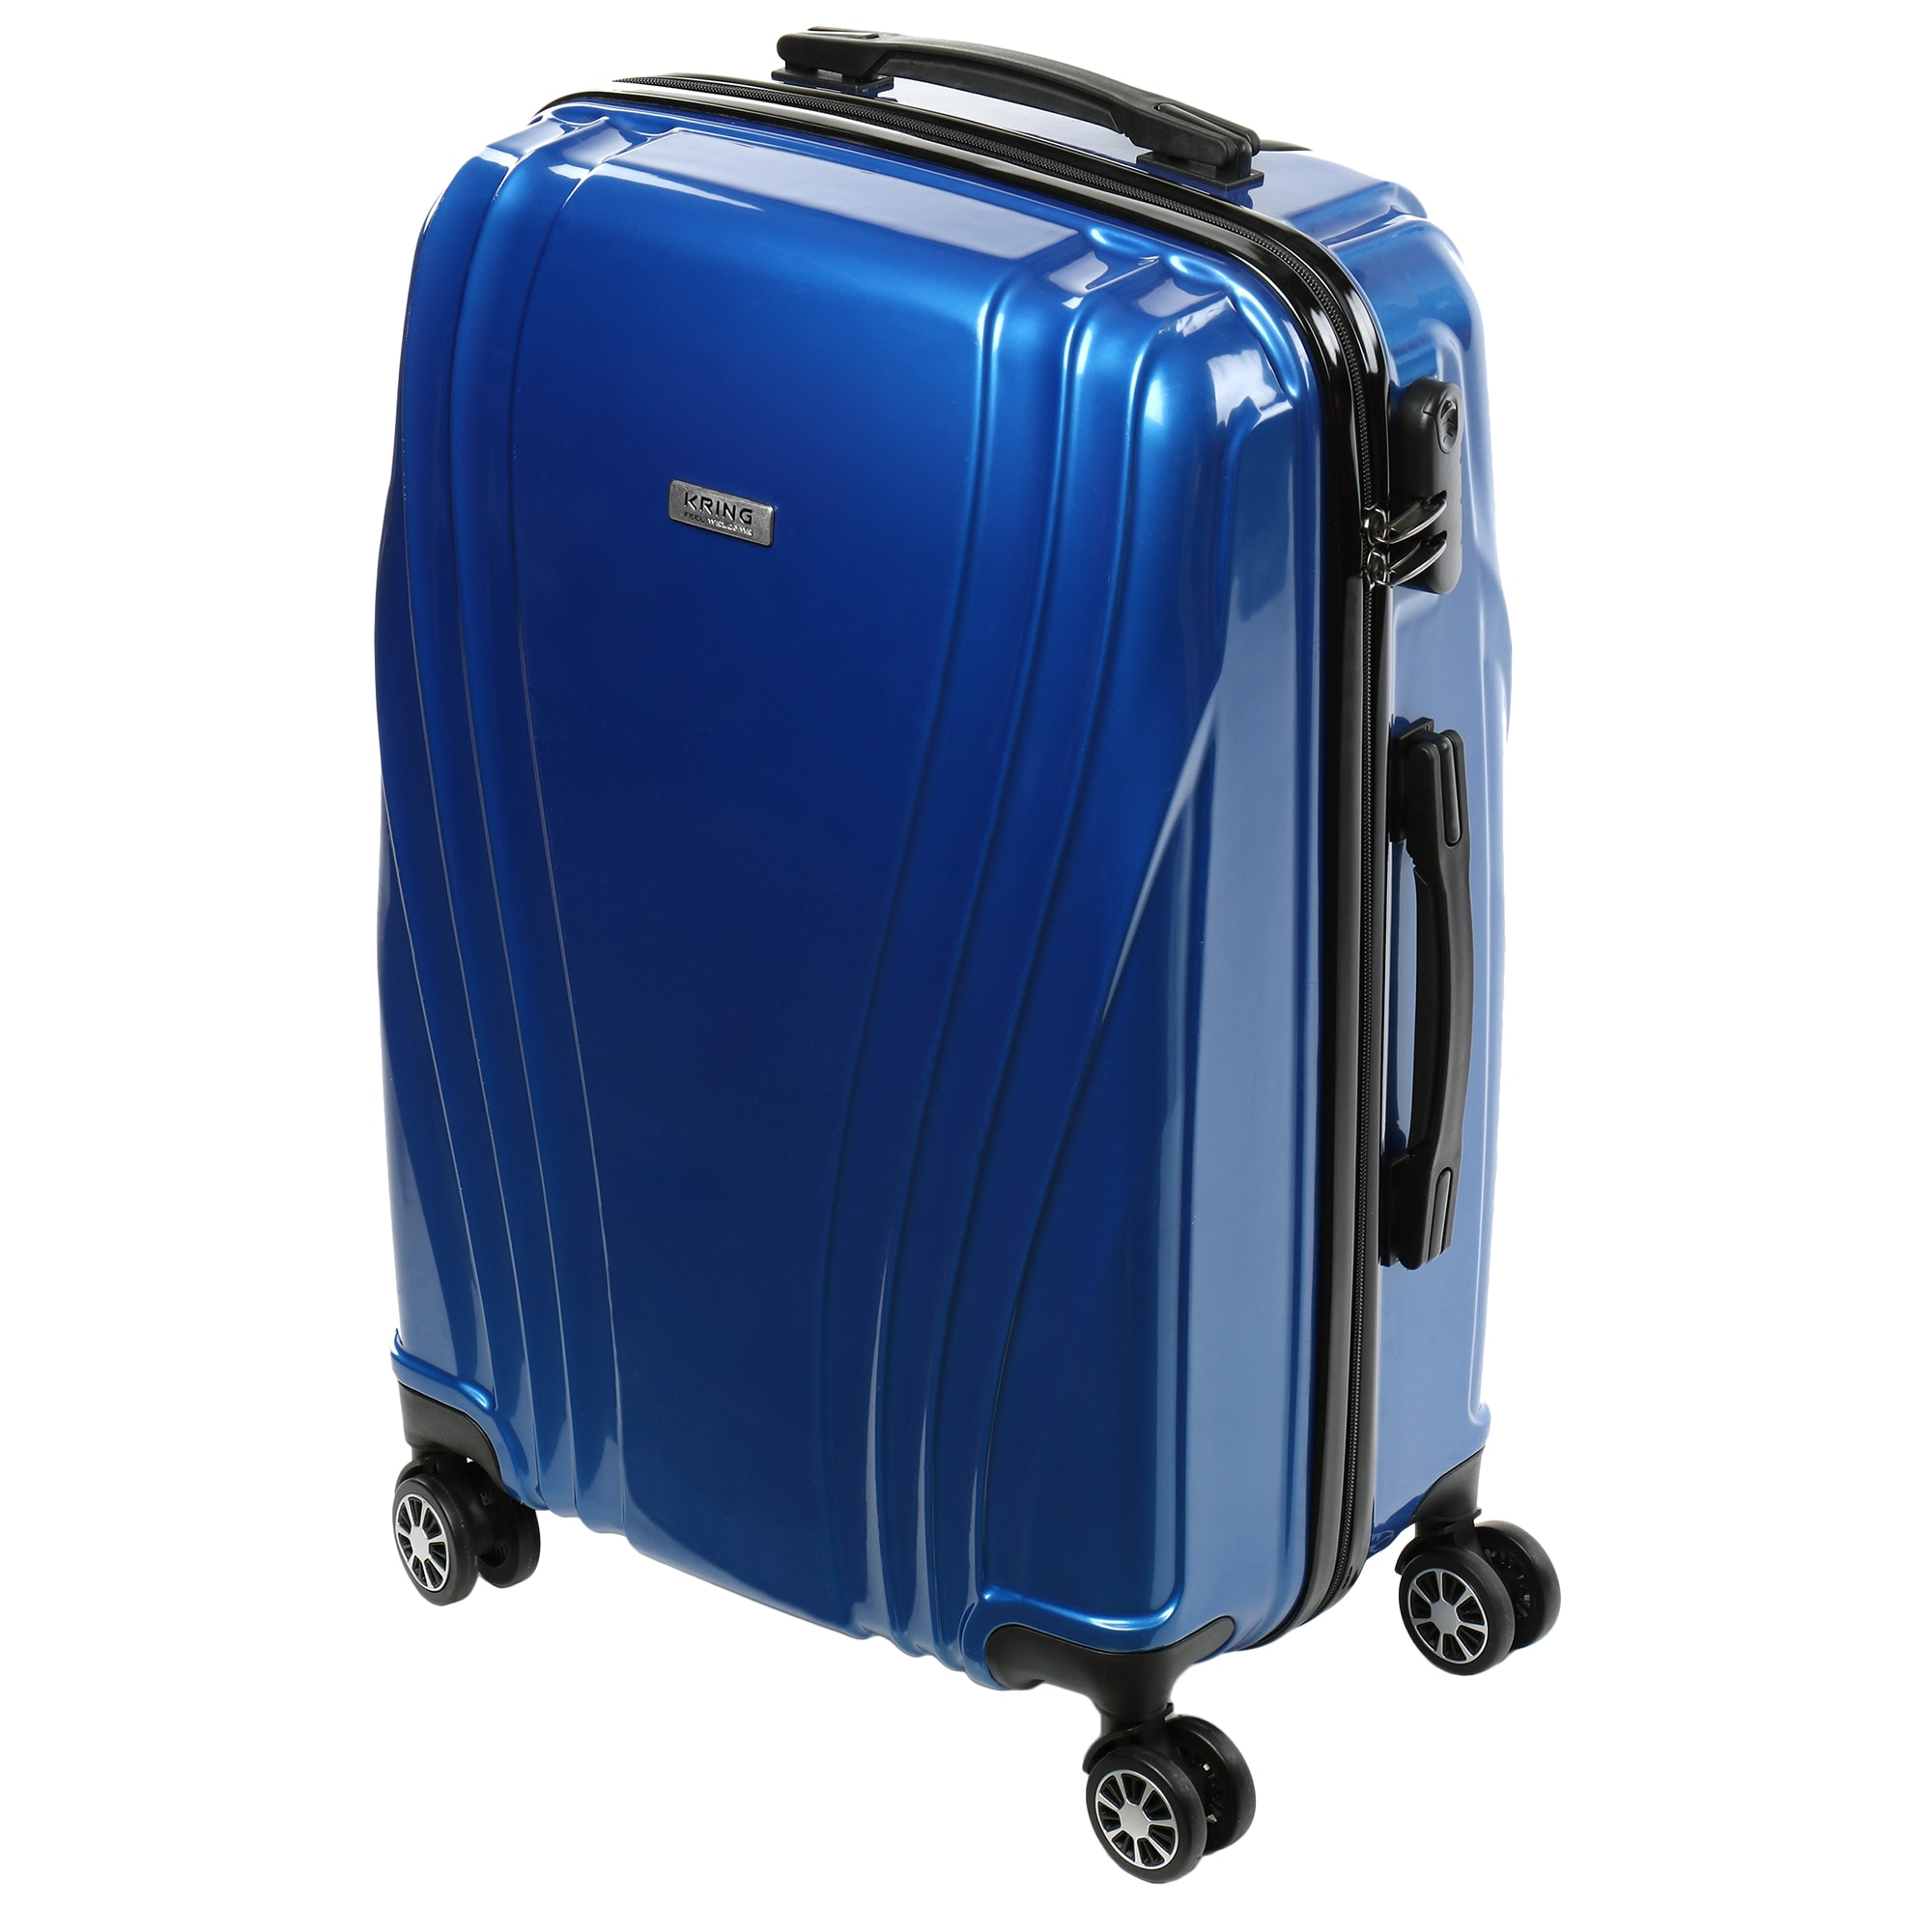 Fotografie Troler Kring JetSet, ABS+PC 55 cm, Blue